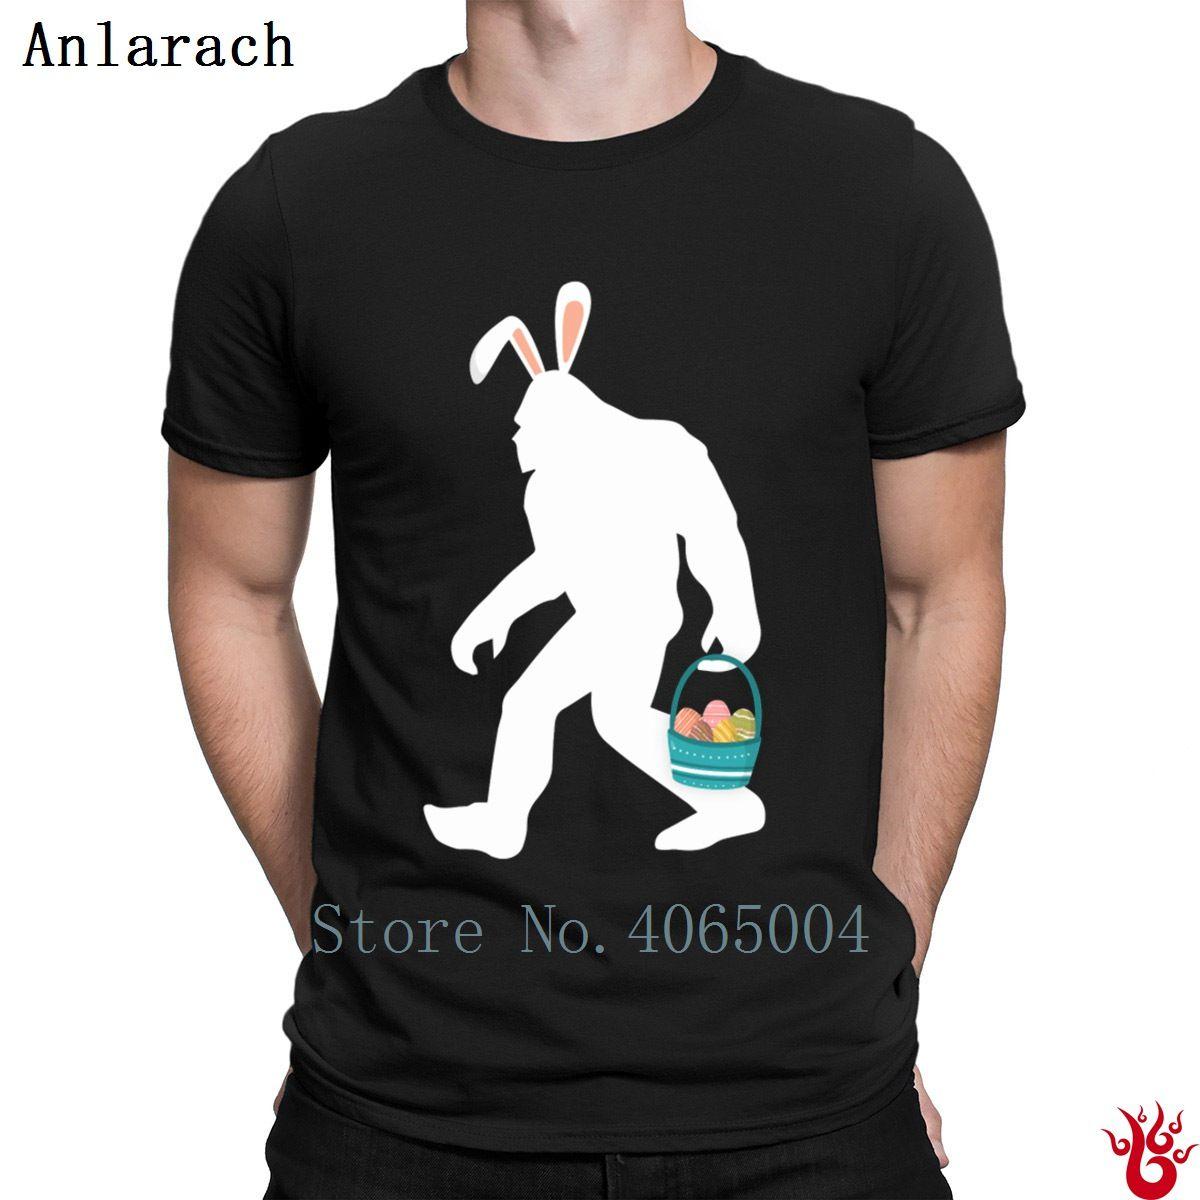 174f696c3 Easter Egg Hunt Bigfoot T-Shirt Funny Trend Euro Size S-3xl Men's Tshirt  Summer Interesting Leisure Short Sleeve Pop Top Tee